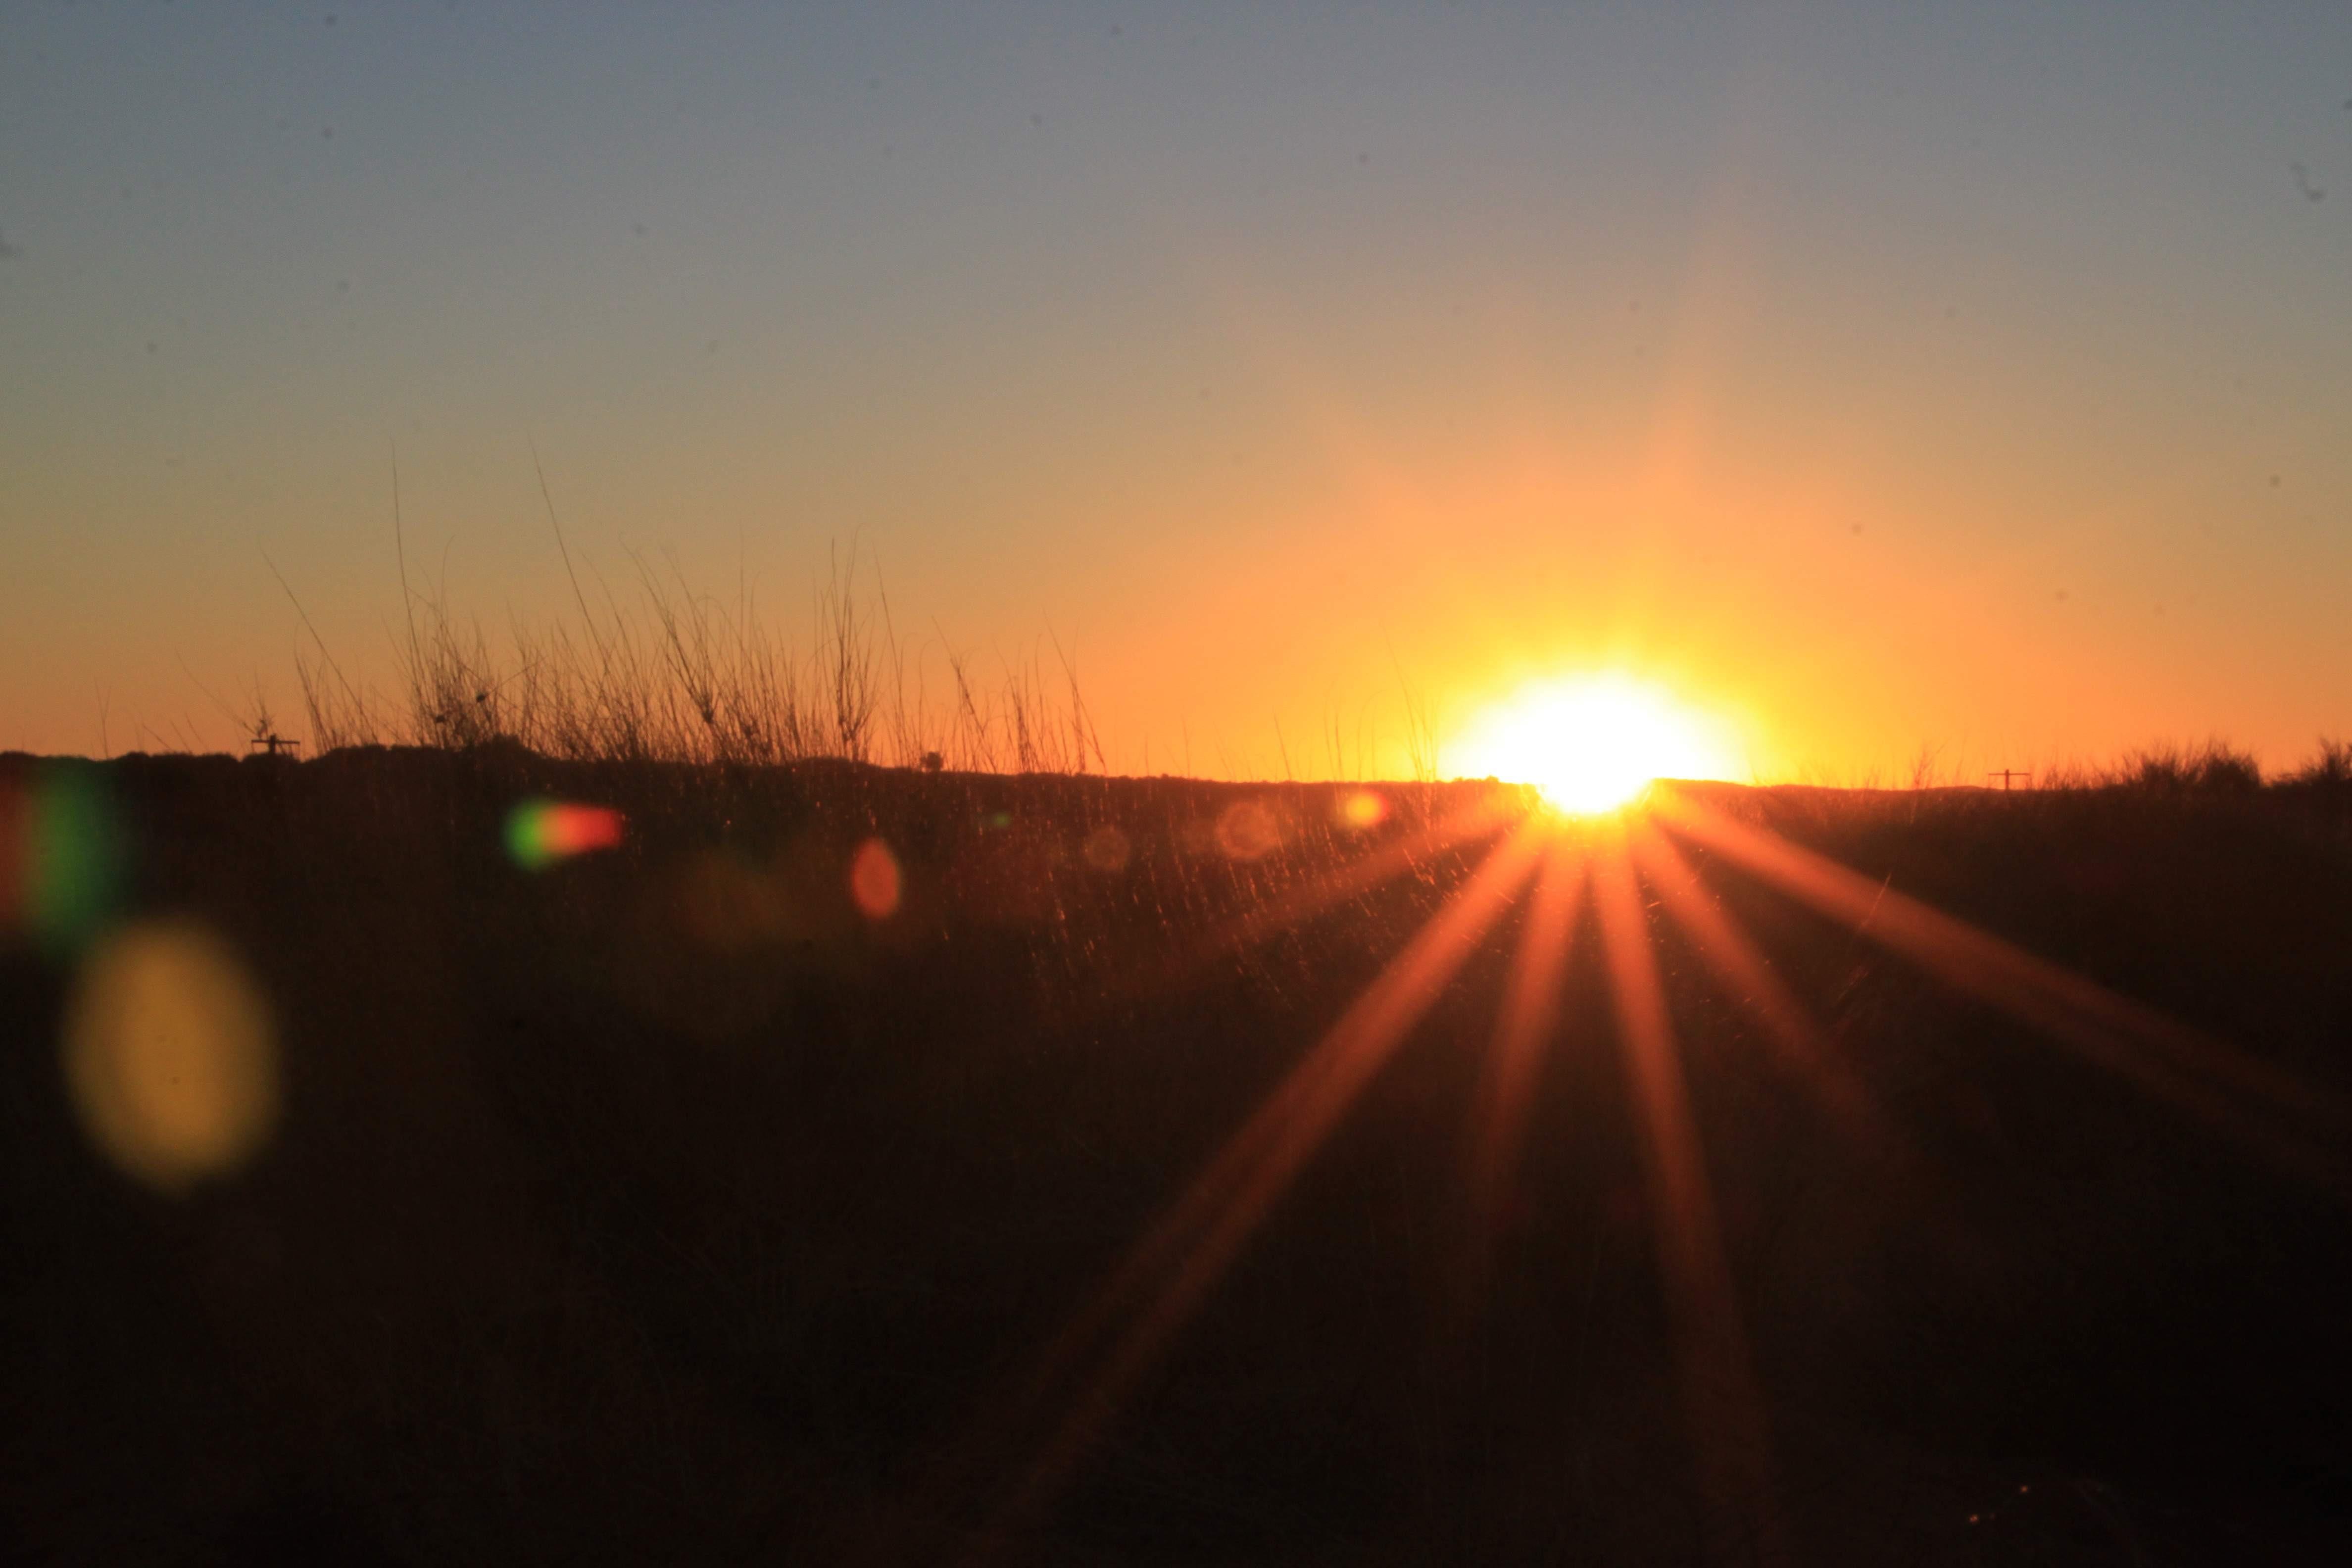 sunset in the Kgalagadi desert